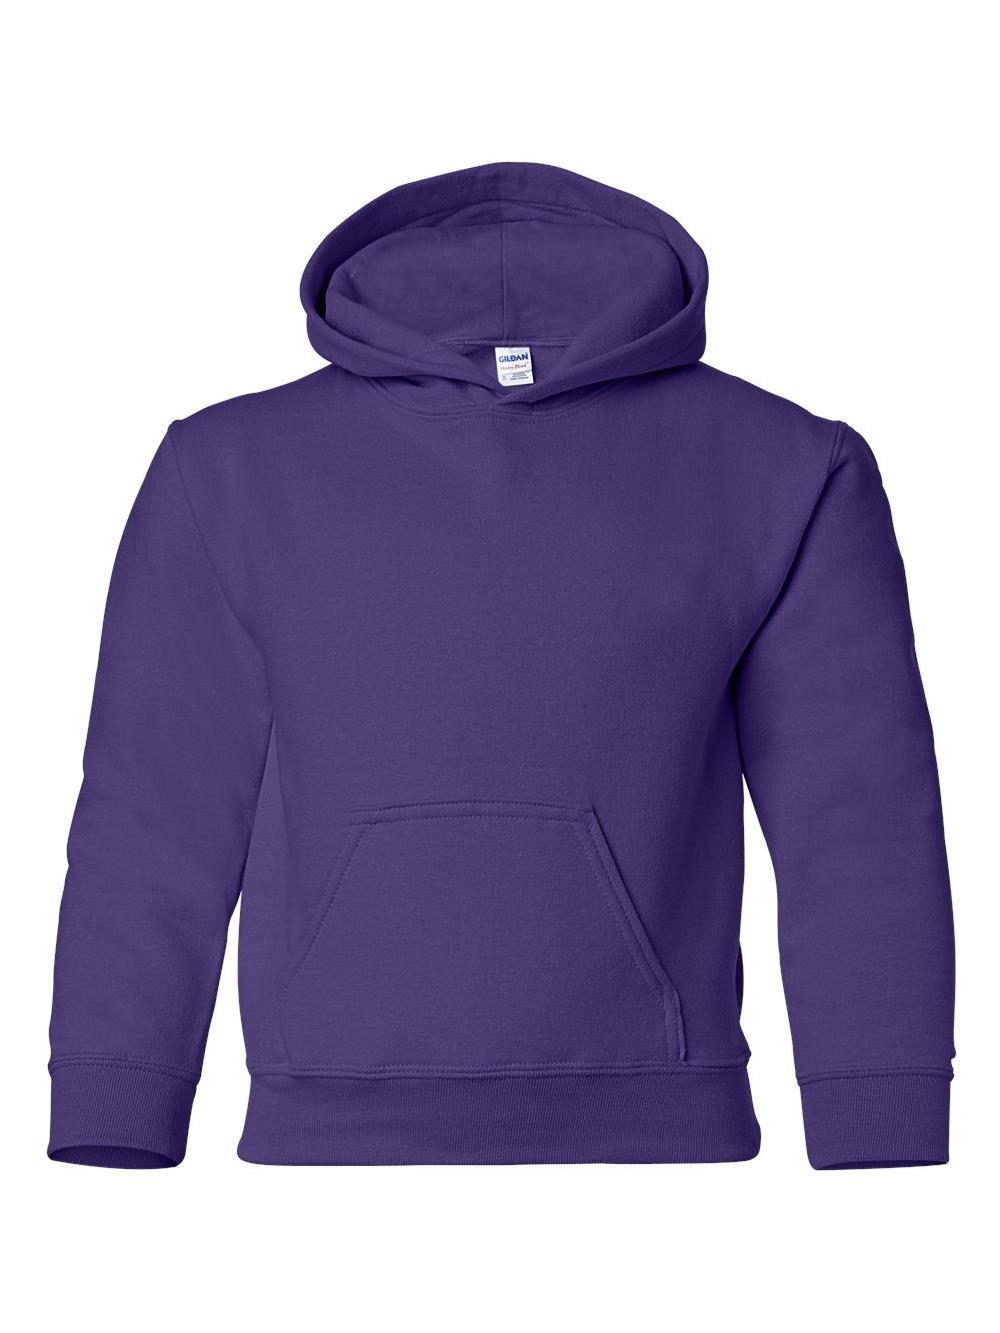 18500B Gildan Fleece Heavy Blend Youth Hooded Sweatshirt